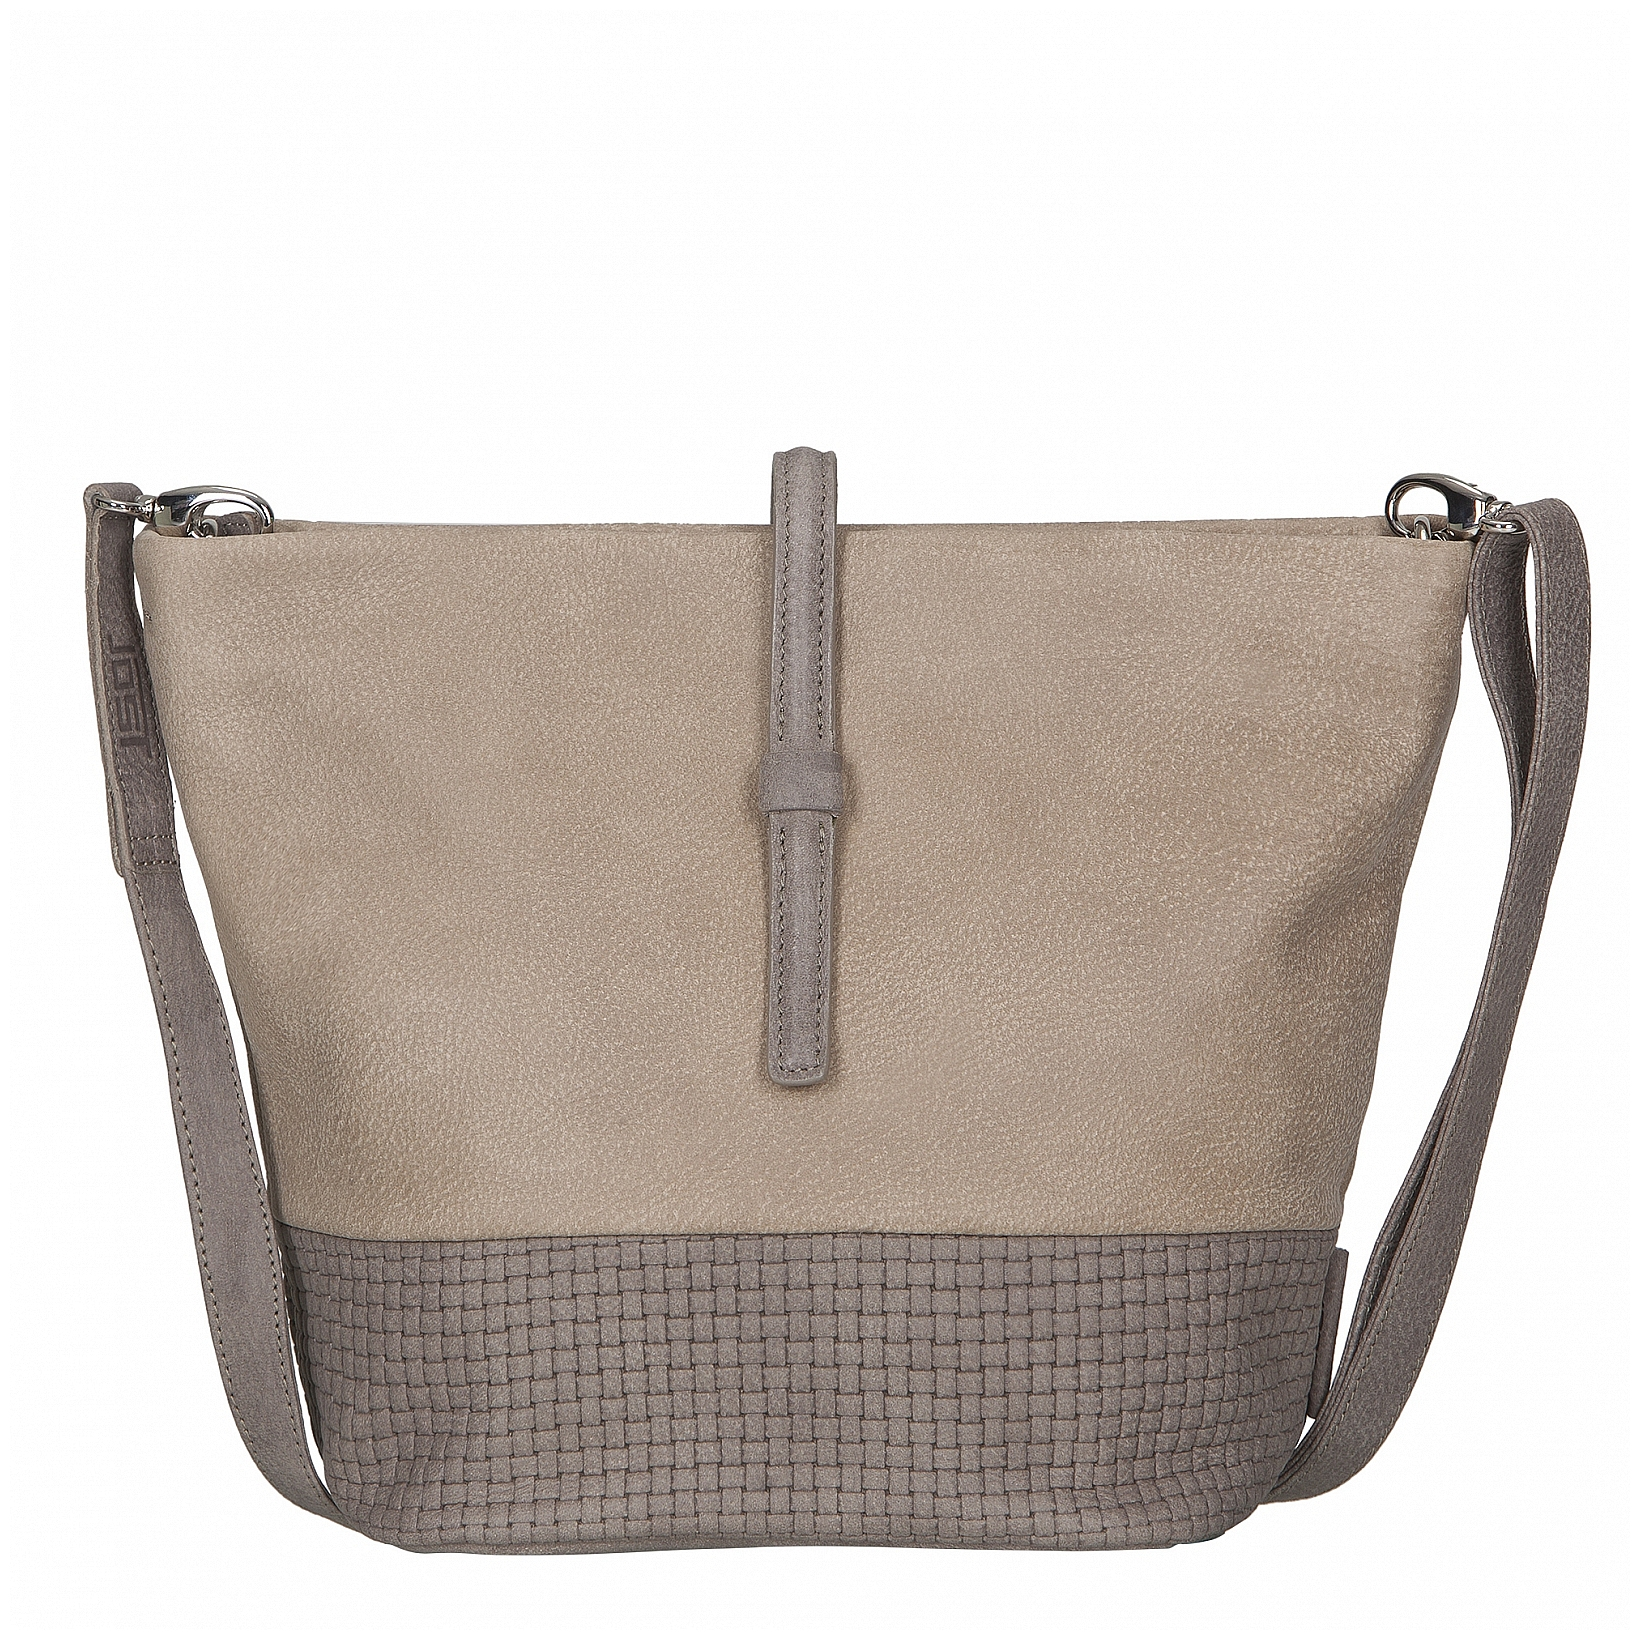 JOST Dámská kožená taška přes rameno TRECCIA 2591-998 pískovo-béžová